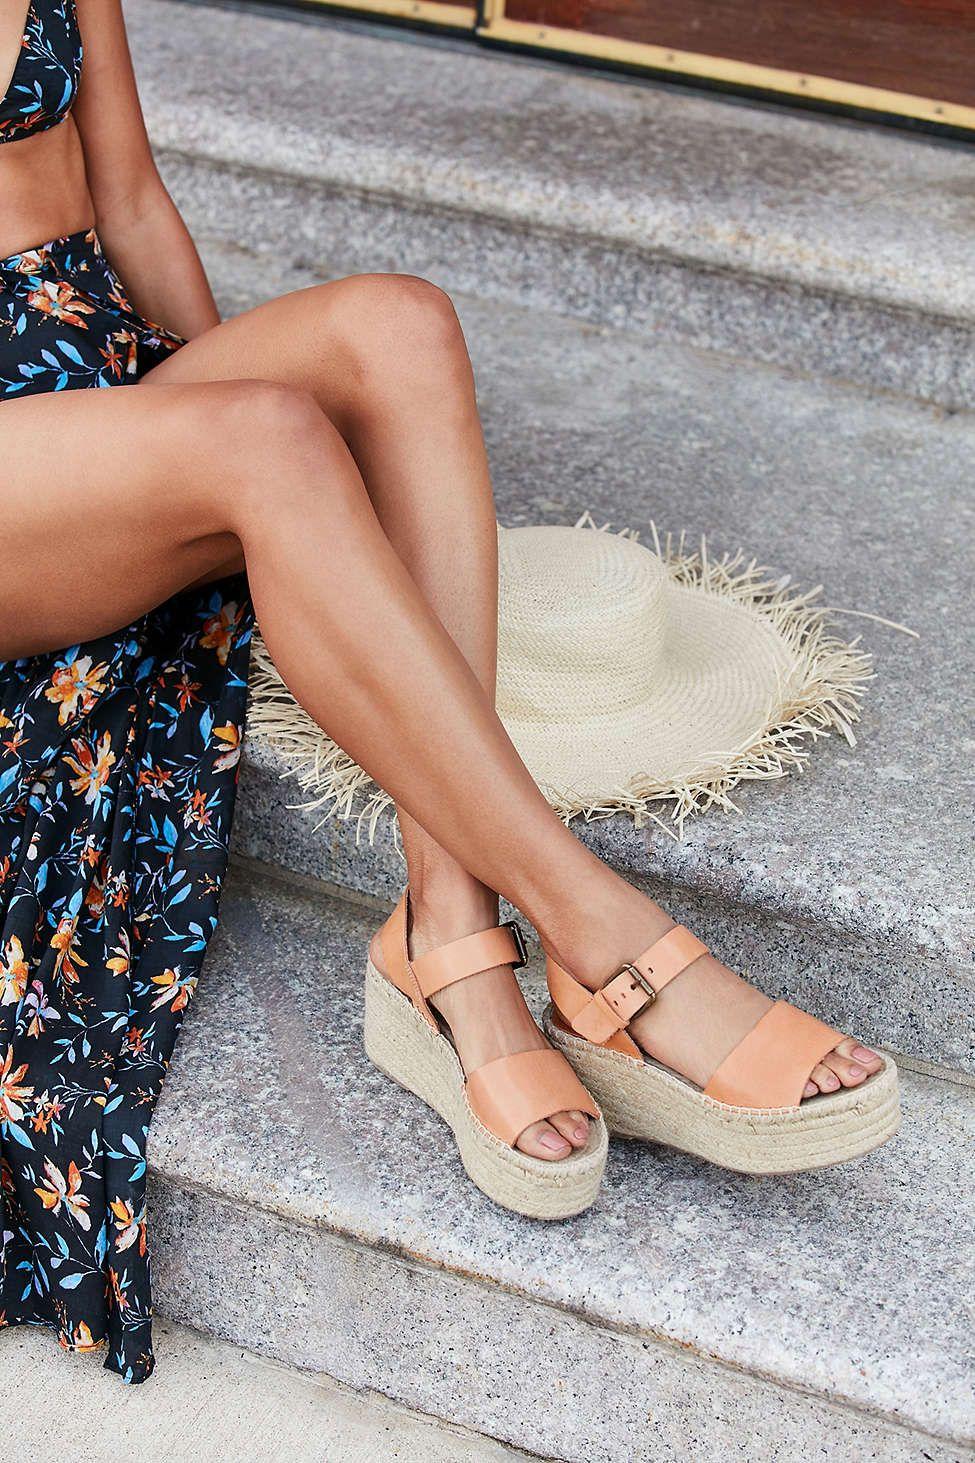 Soludos Minorca High Platform Sandal Style Profile In